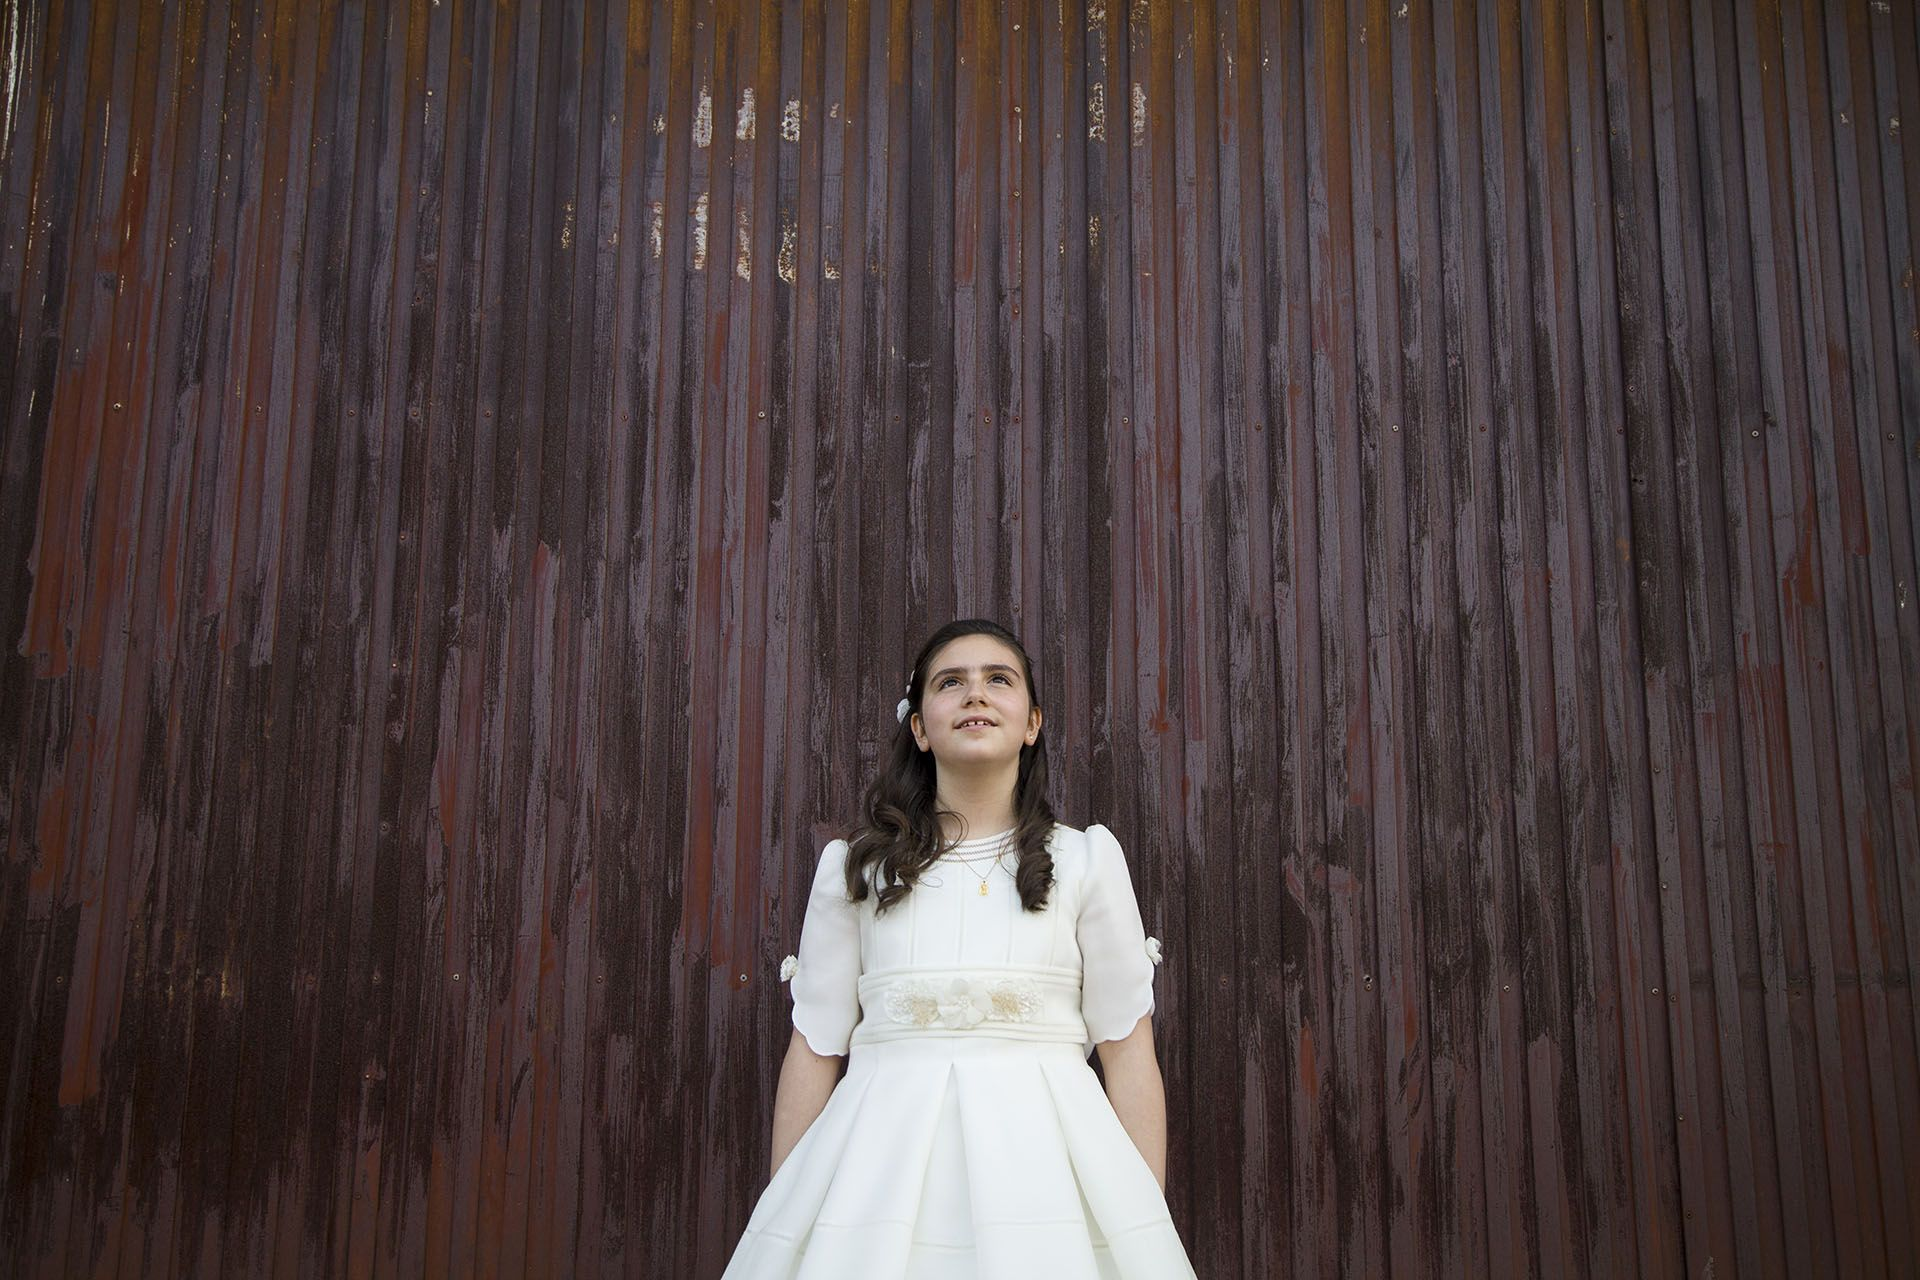 angela coronel-fotografia-comunion-molina de aragon-sara